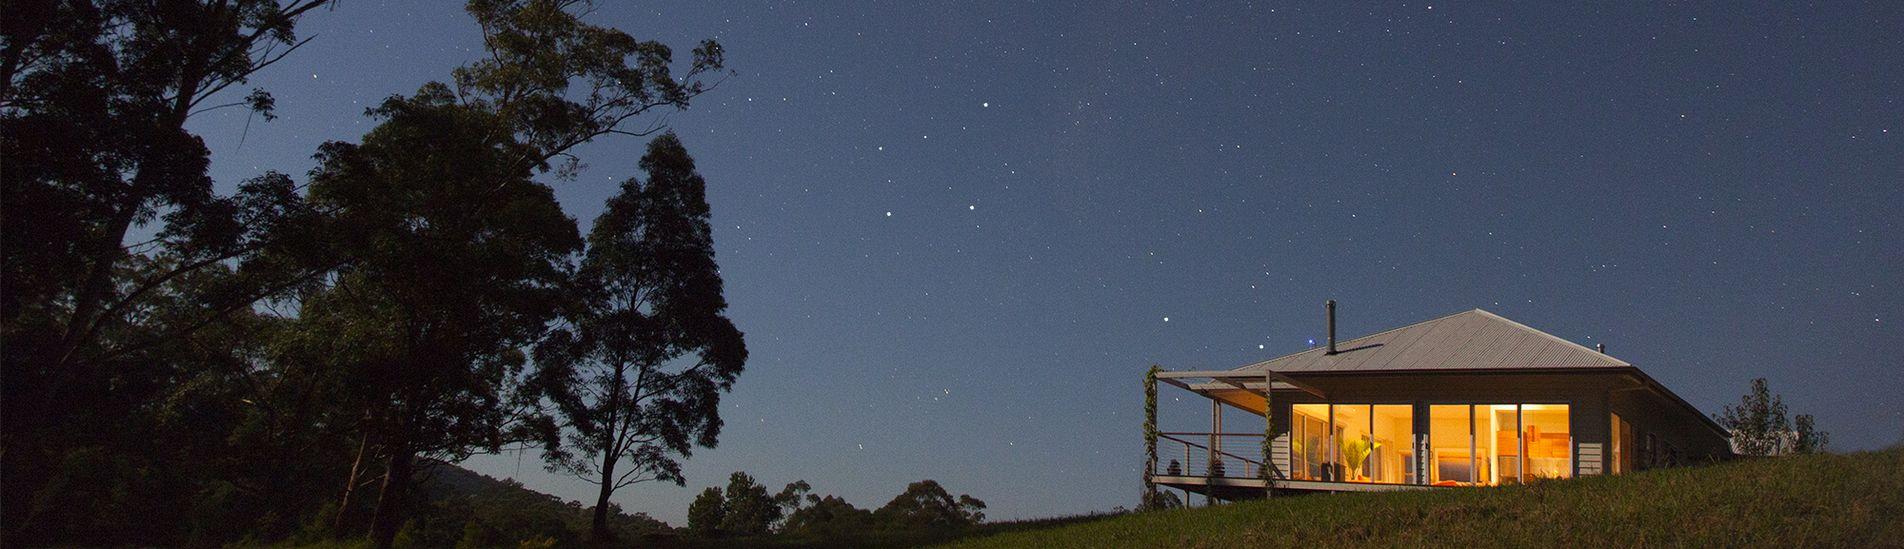 Stars over Wilderberry